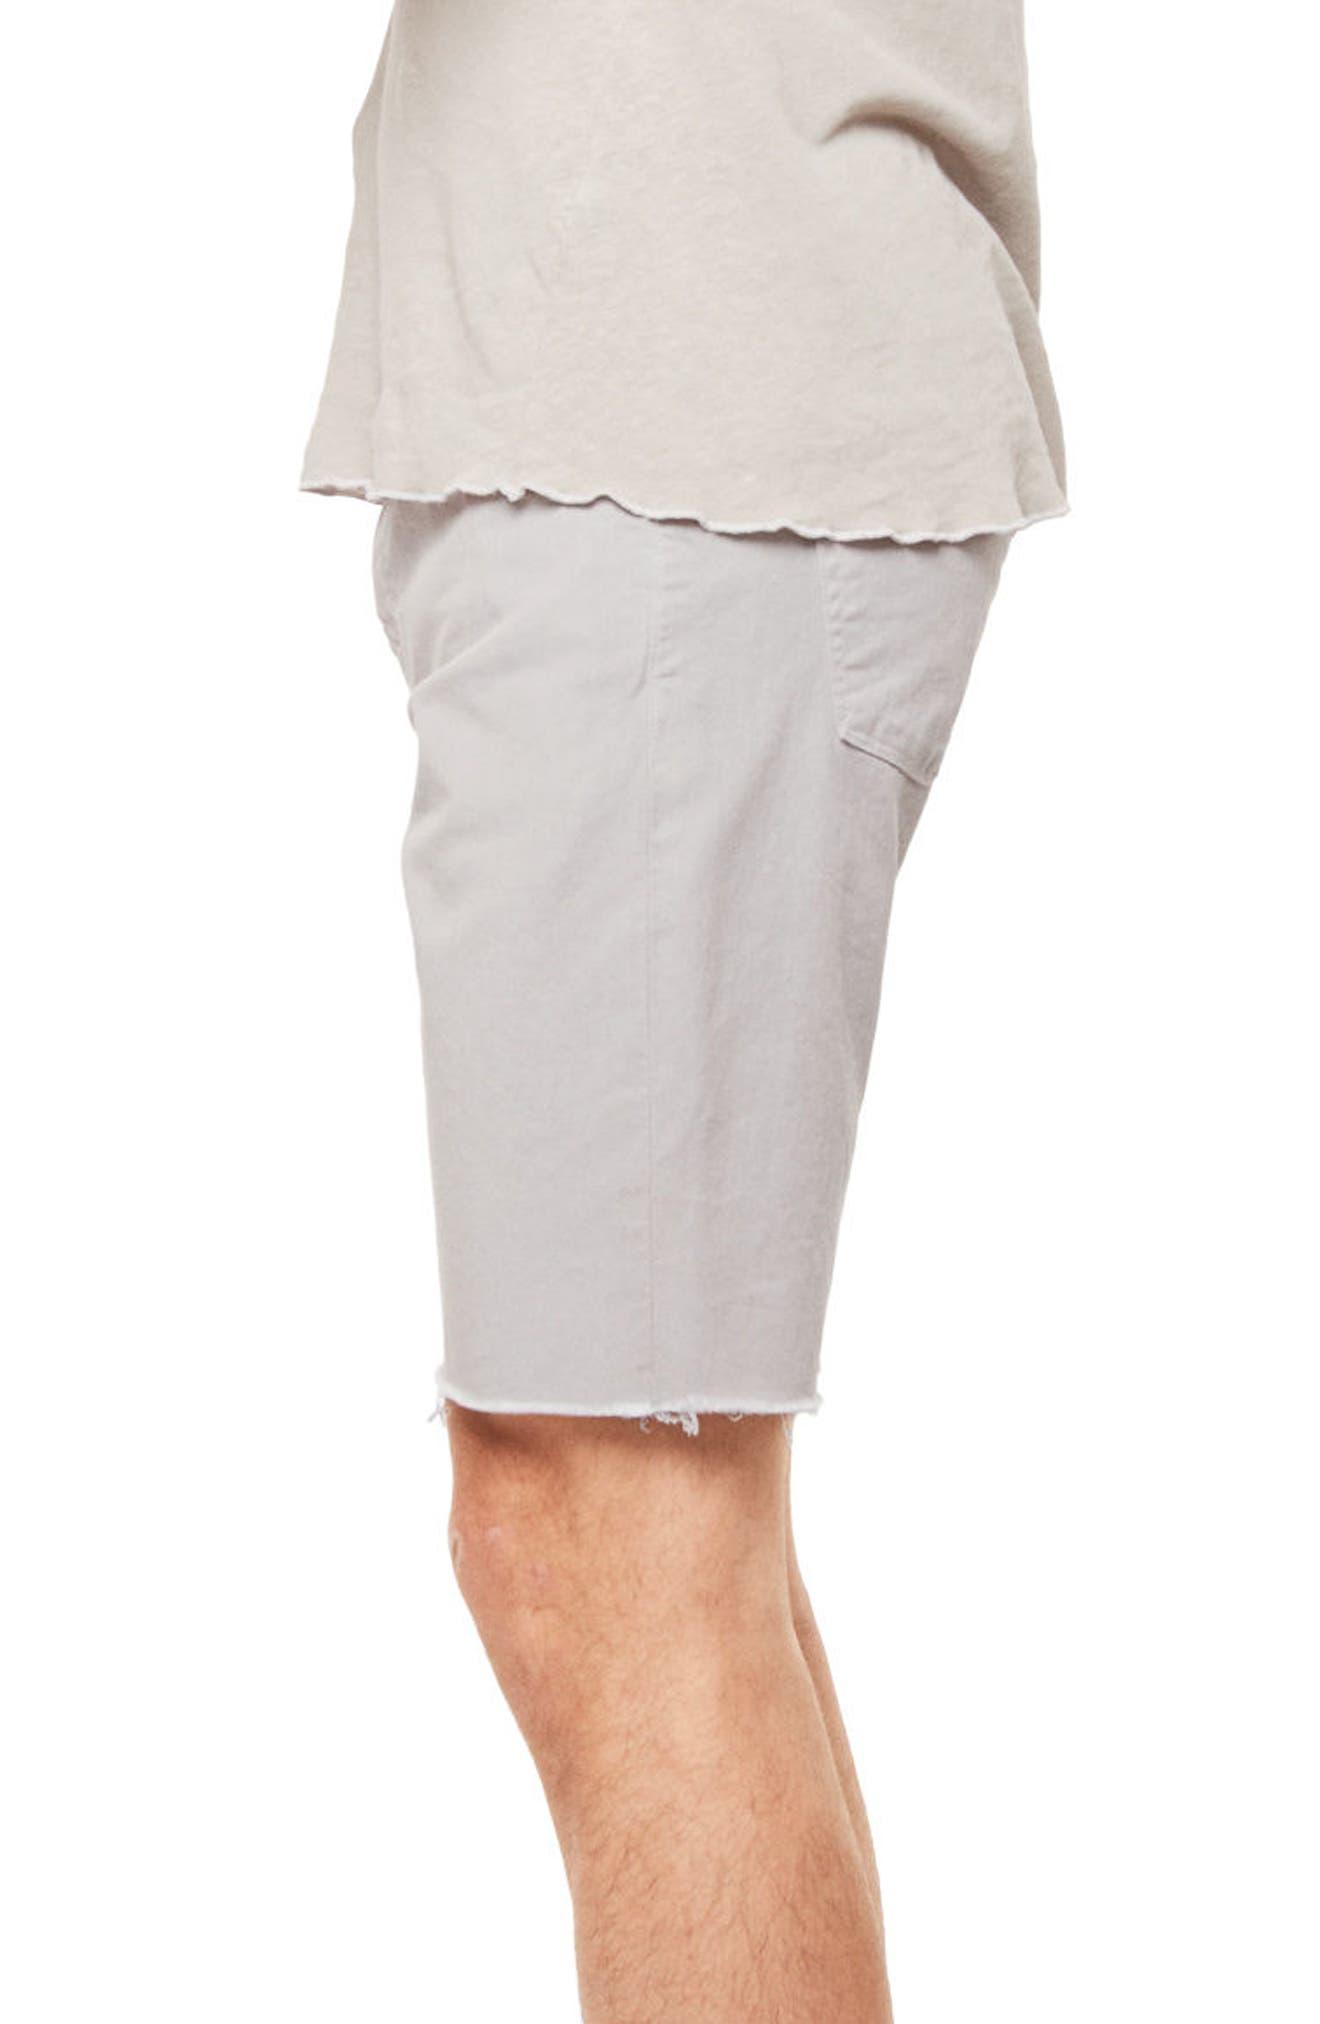 Eli Cutoff Denim Shorts,                             Alternate thumbnail 3, color,                             Reflect